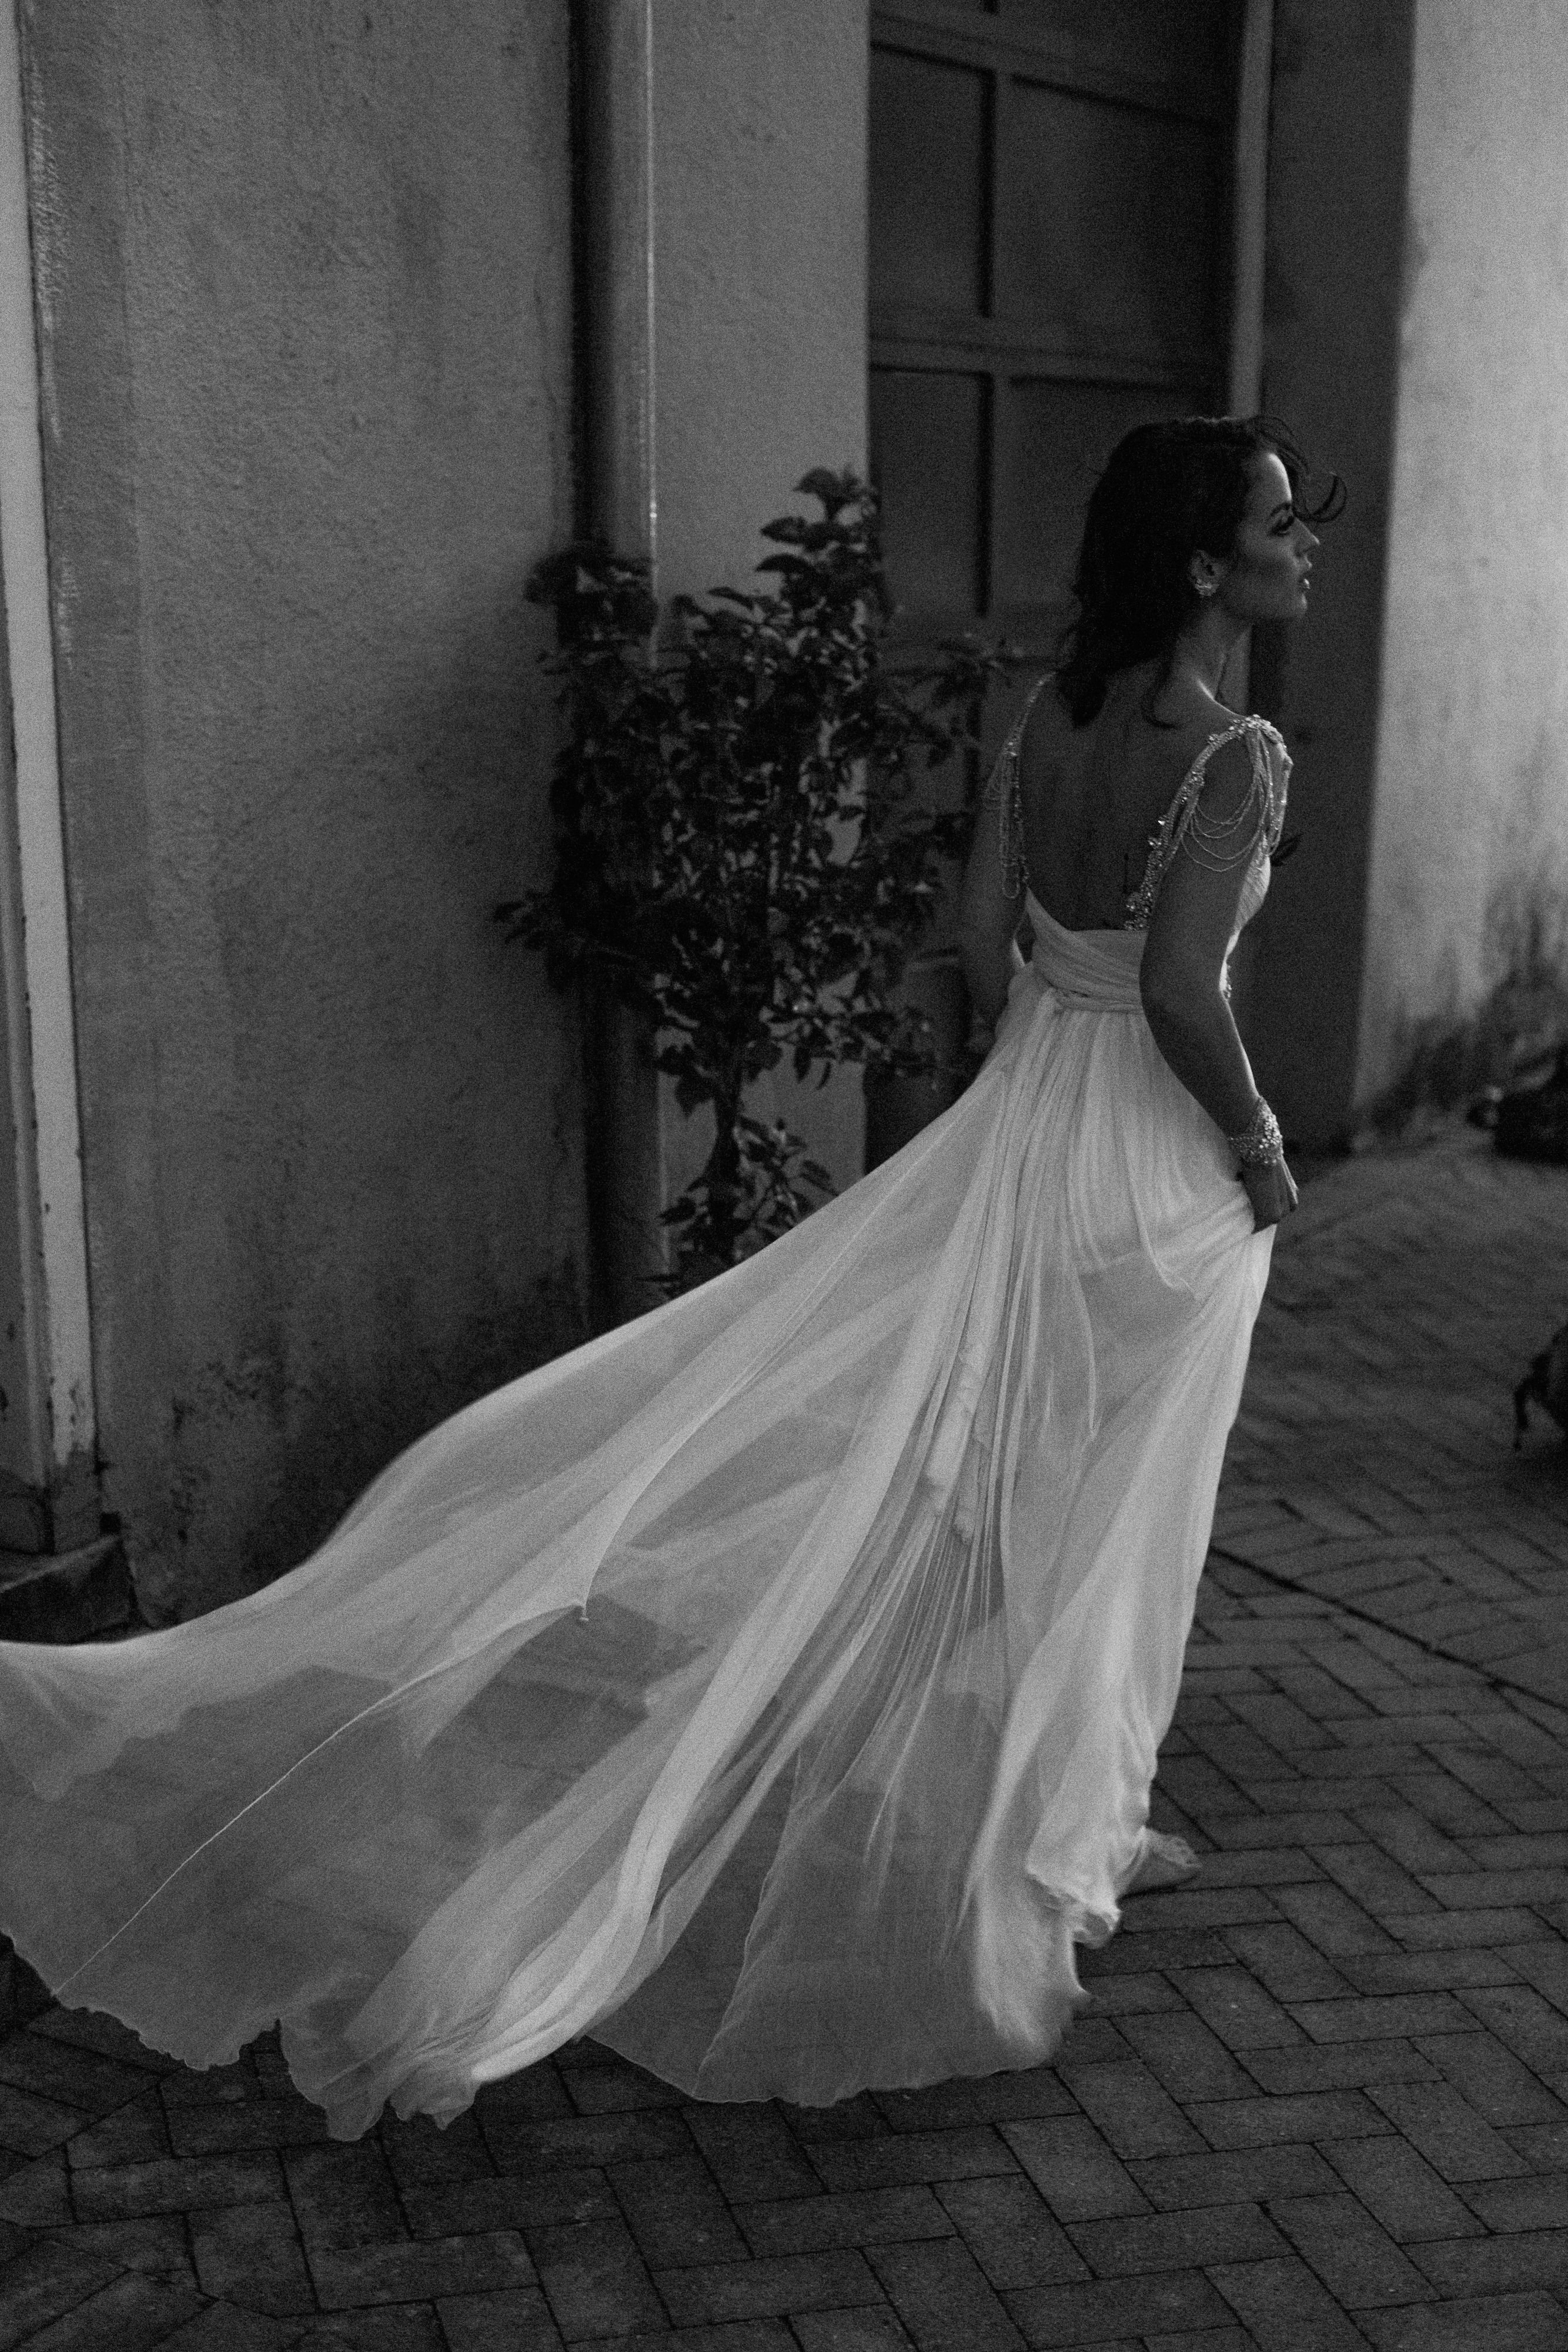 Vintage black wedding dresses  Pin by Cherish Roberts on My LoVeS LiKEs u PaSSioNs  Pinterest